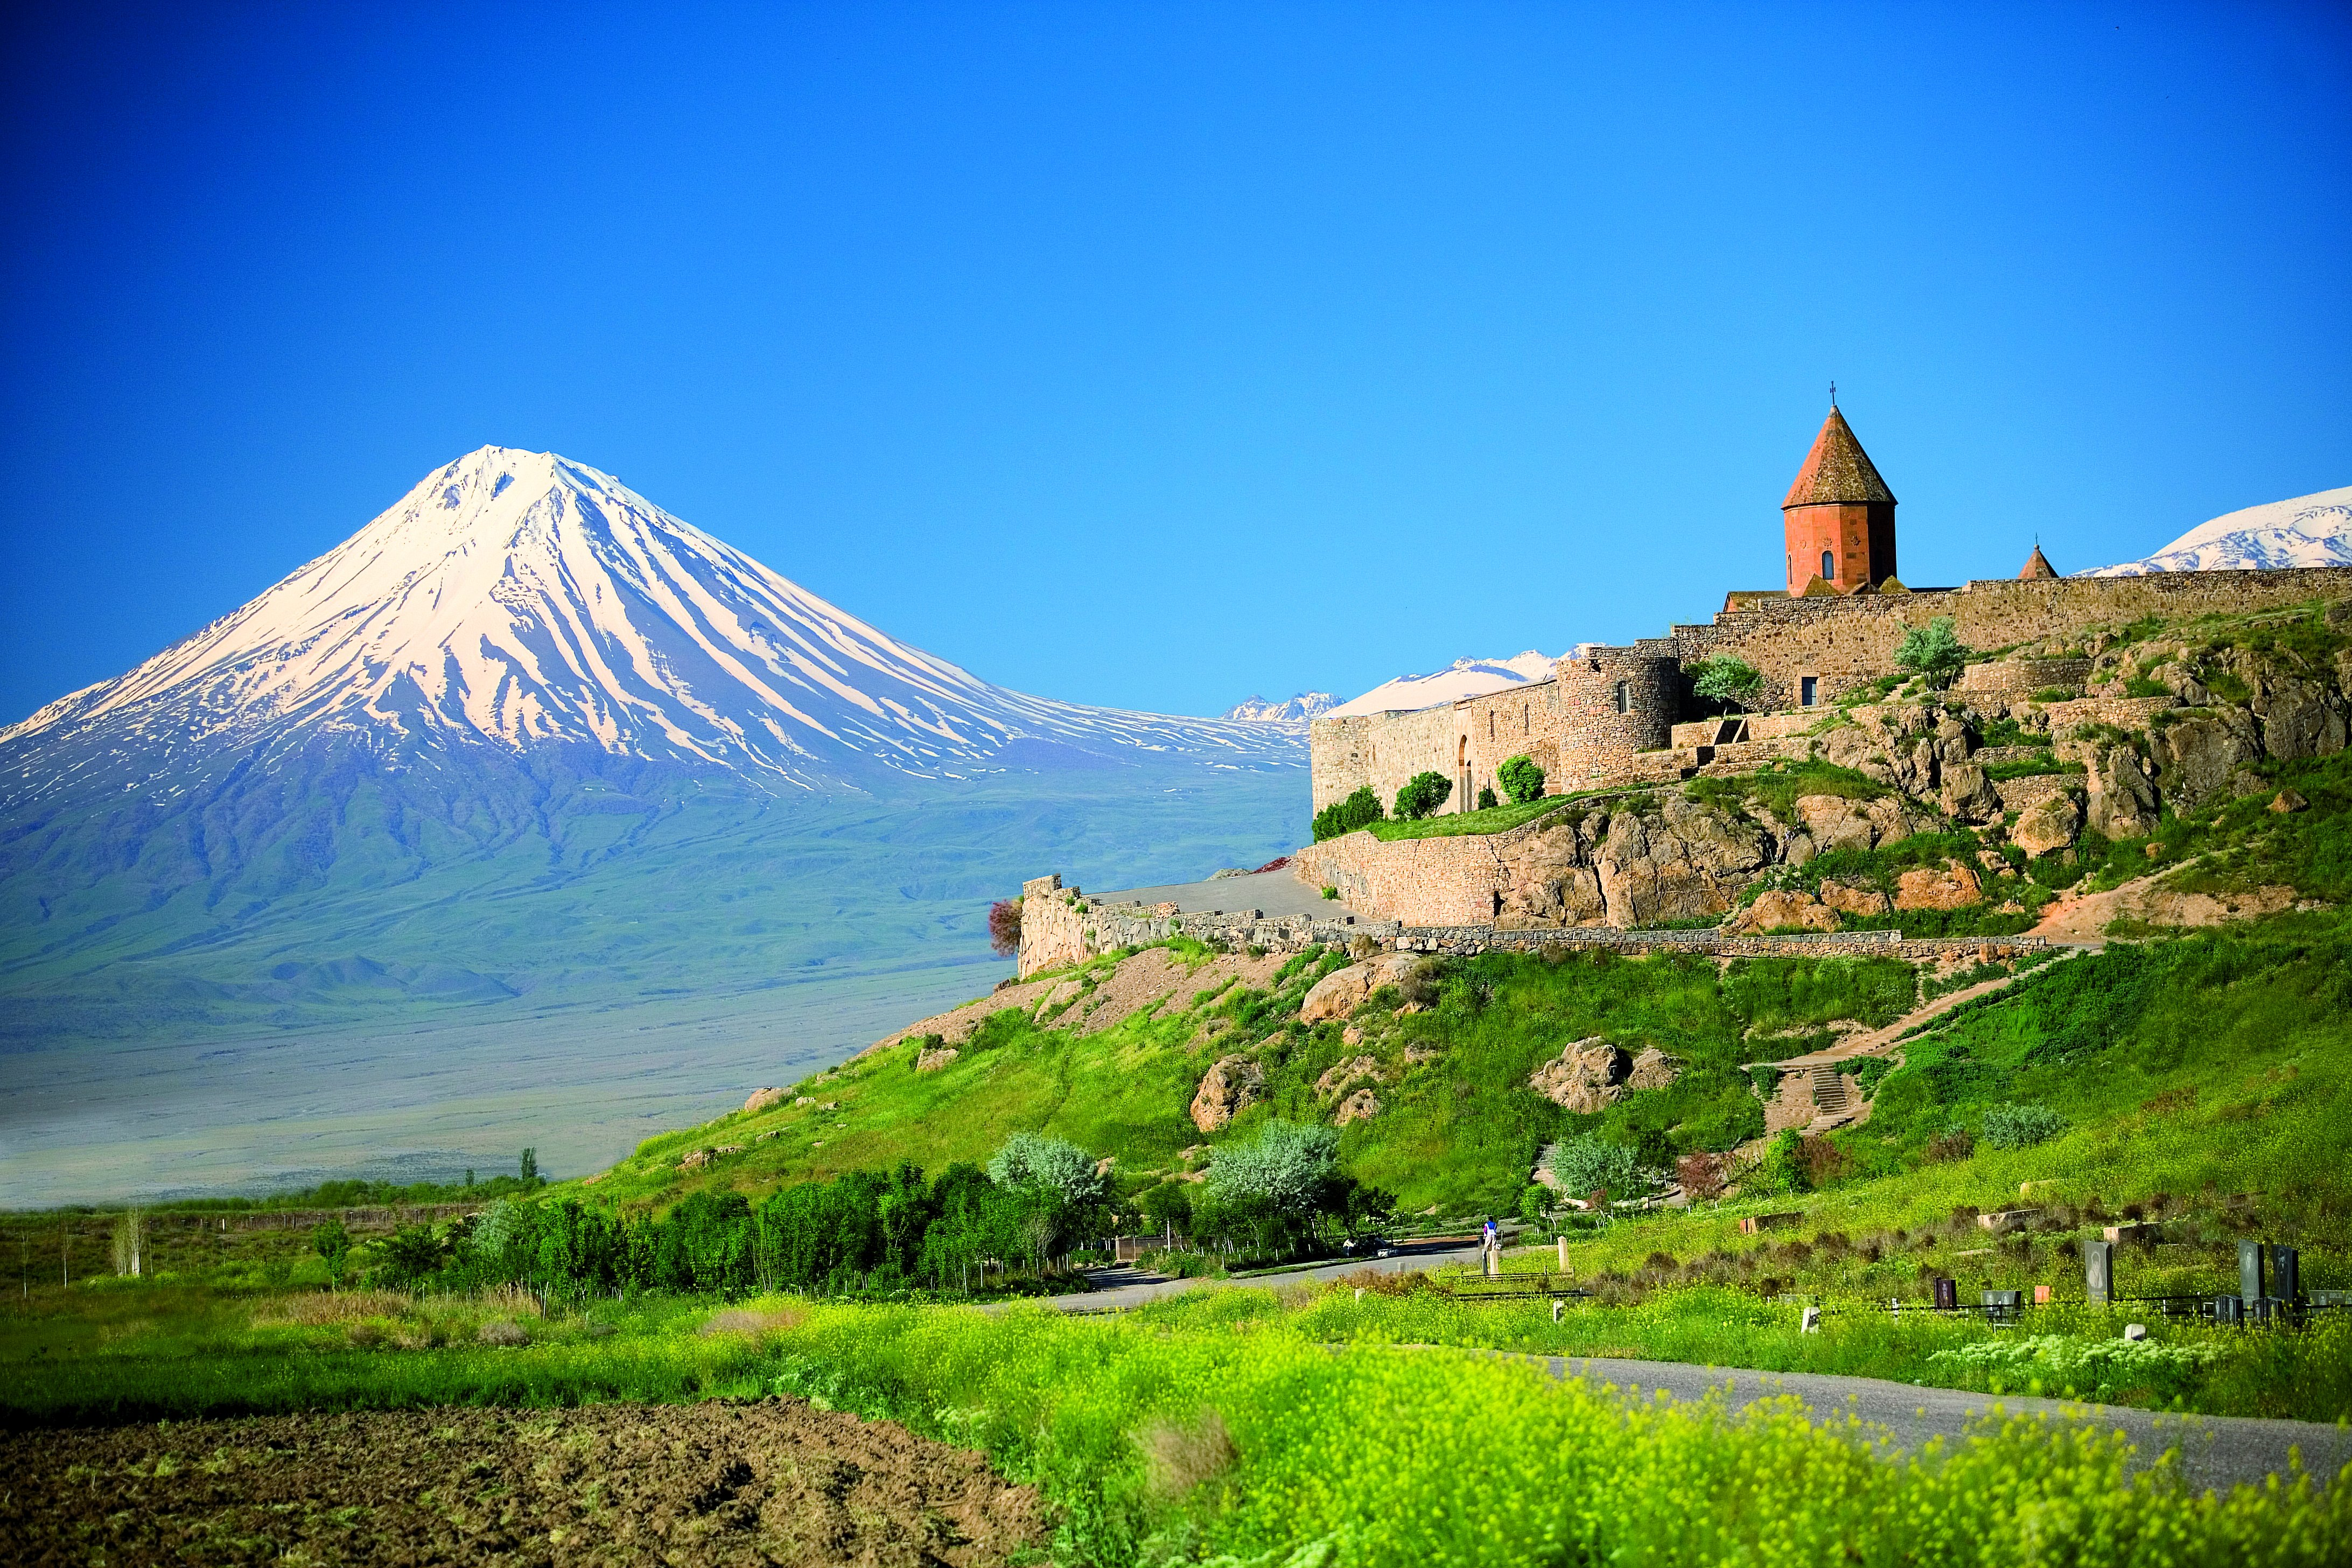 http://tryvel.pt/wp-content/uploads/2014/08/Ararat.jpg